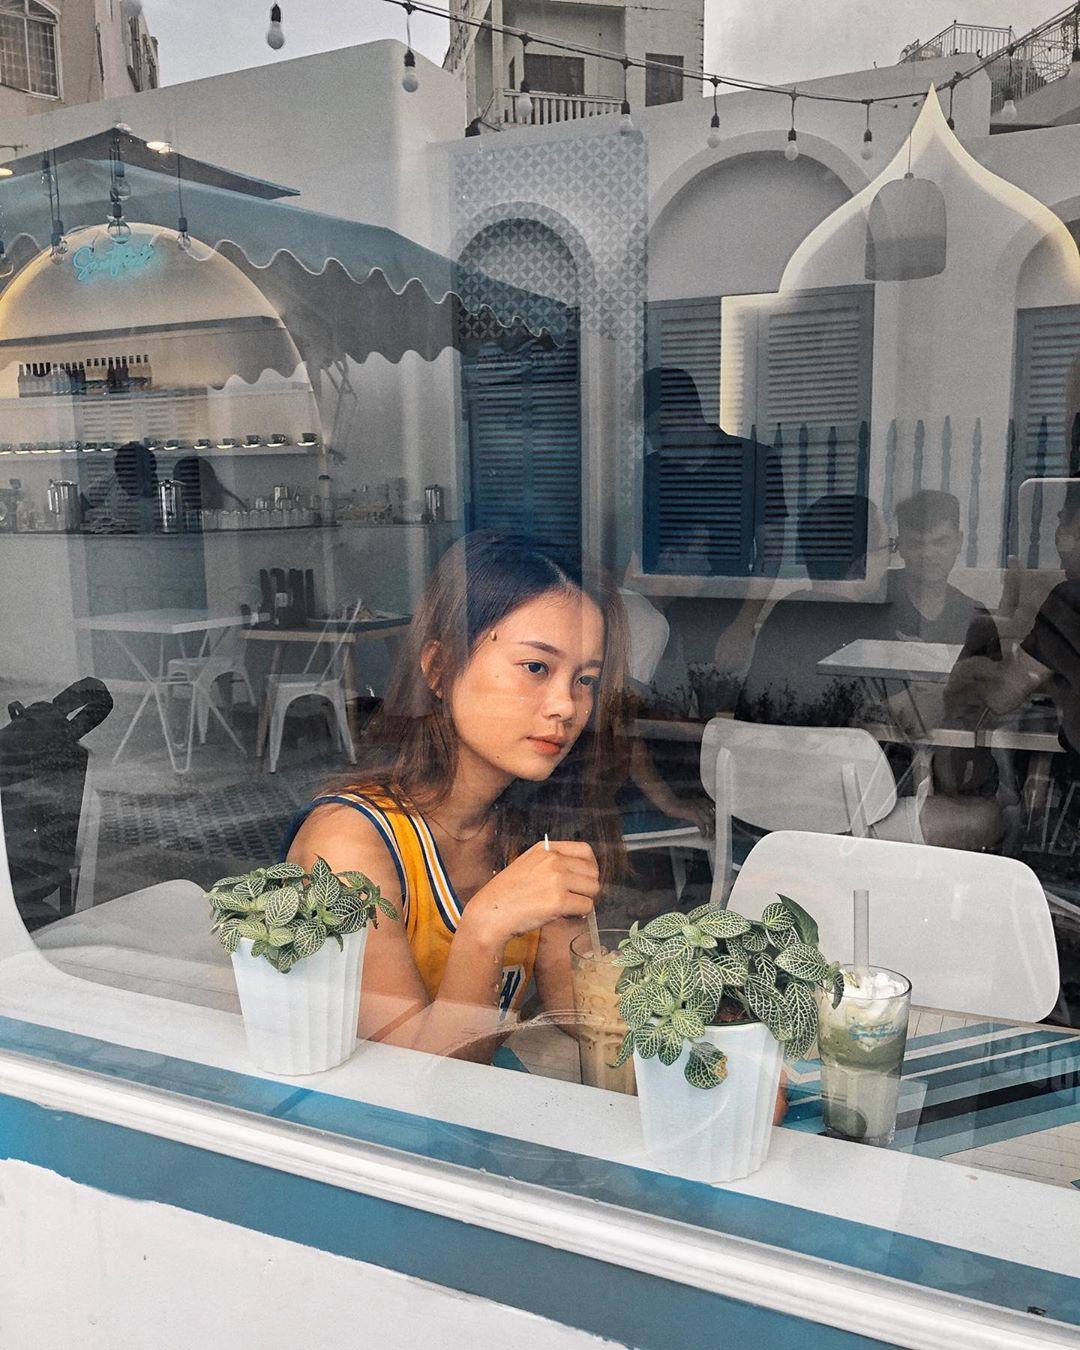 bienhoa_santorini-coffee-bien-hoa-17